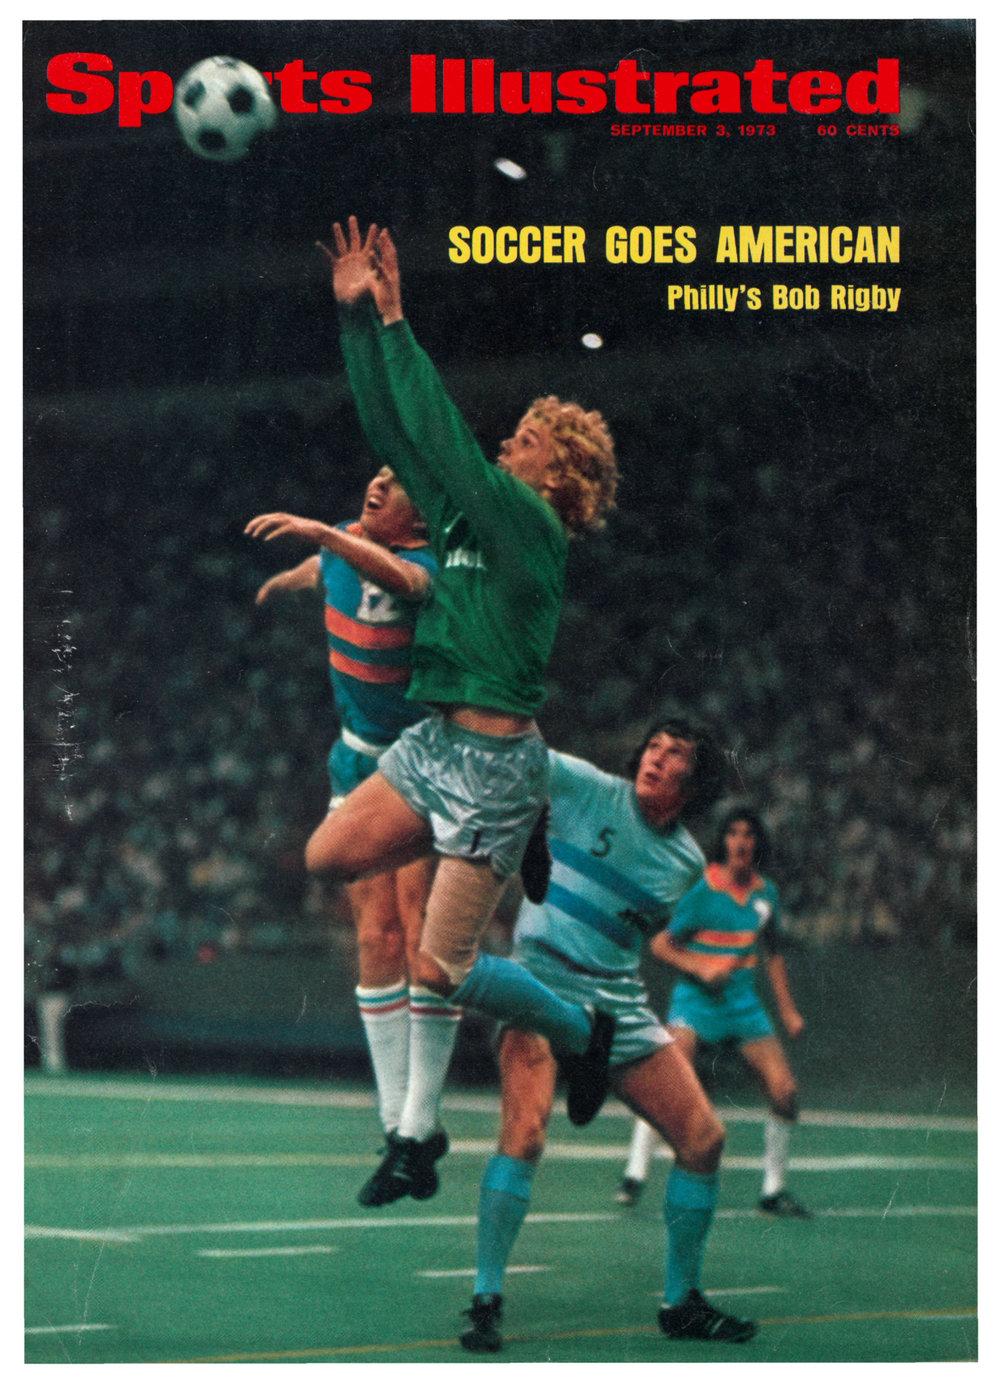 Sports_Illustrated_43210_19730903-001-2048.jpg